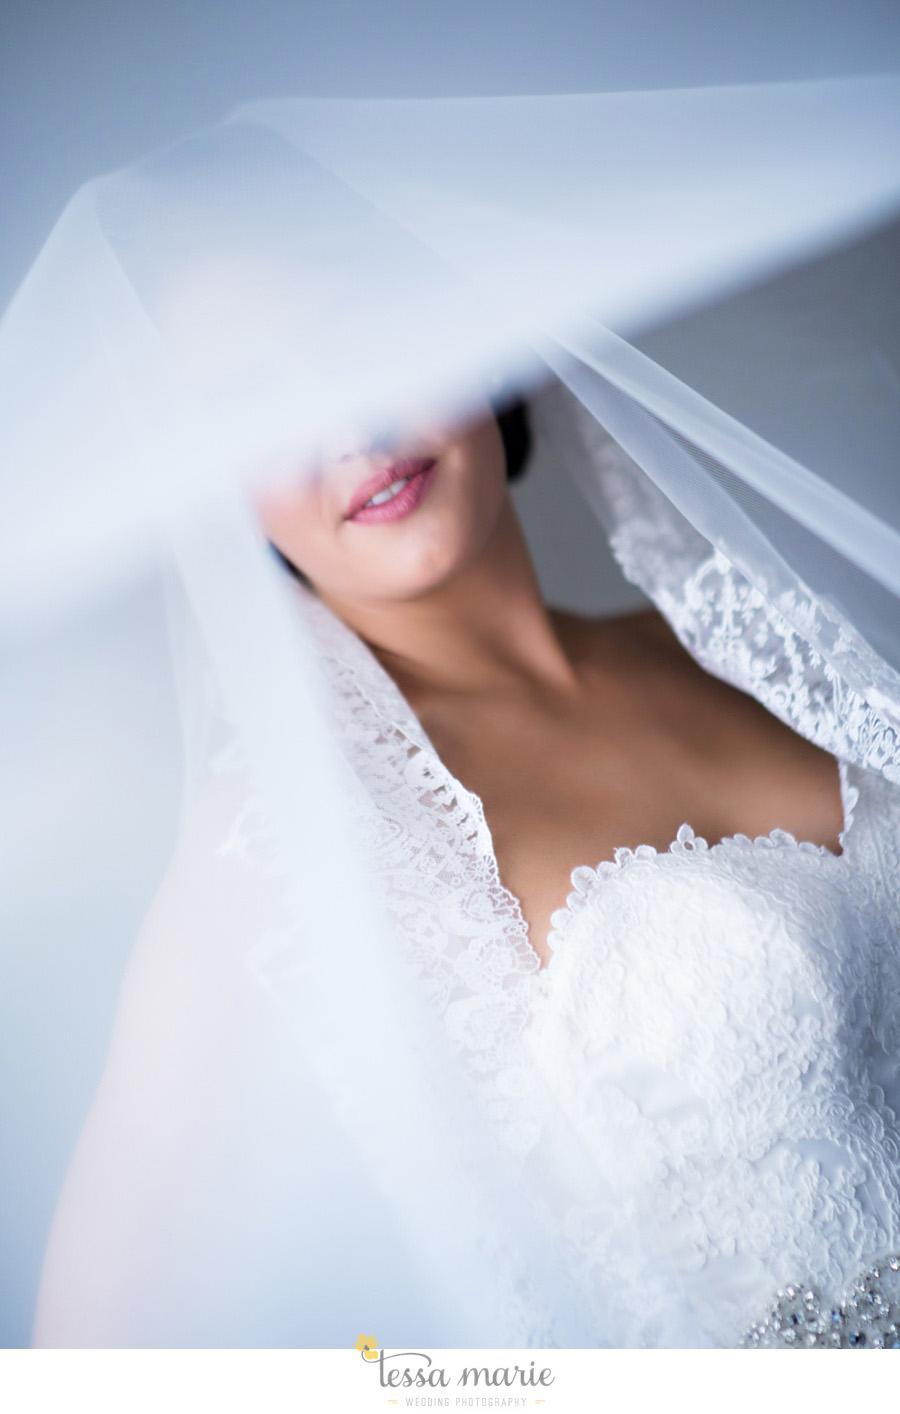 summerour_wedding_northside_united_methodist_church_wedding_tessa_marie_weddings_0018